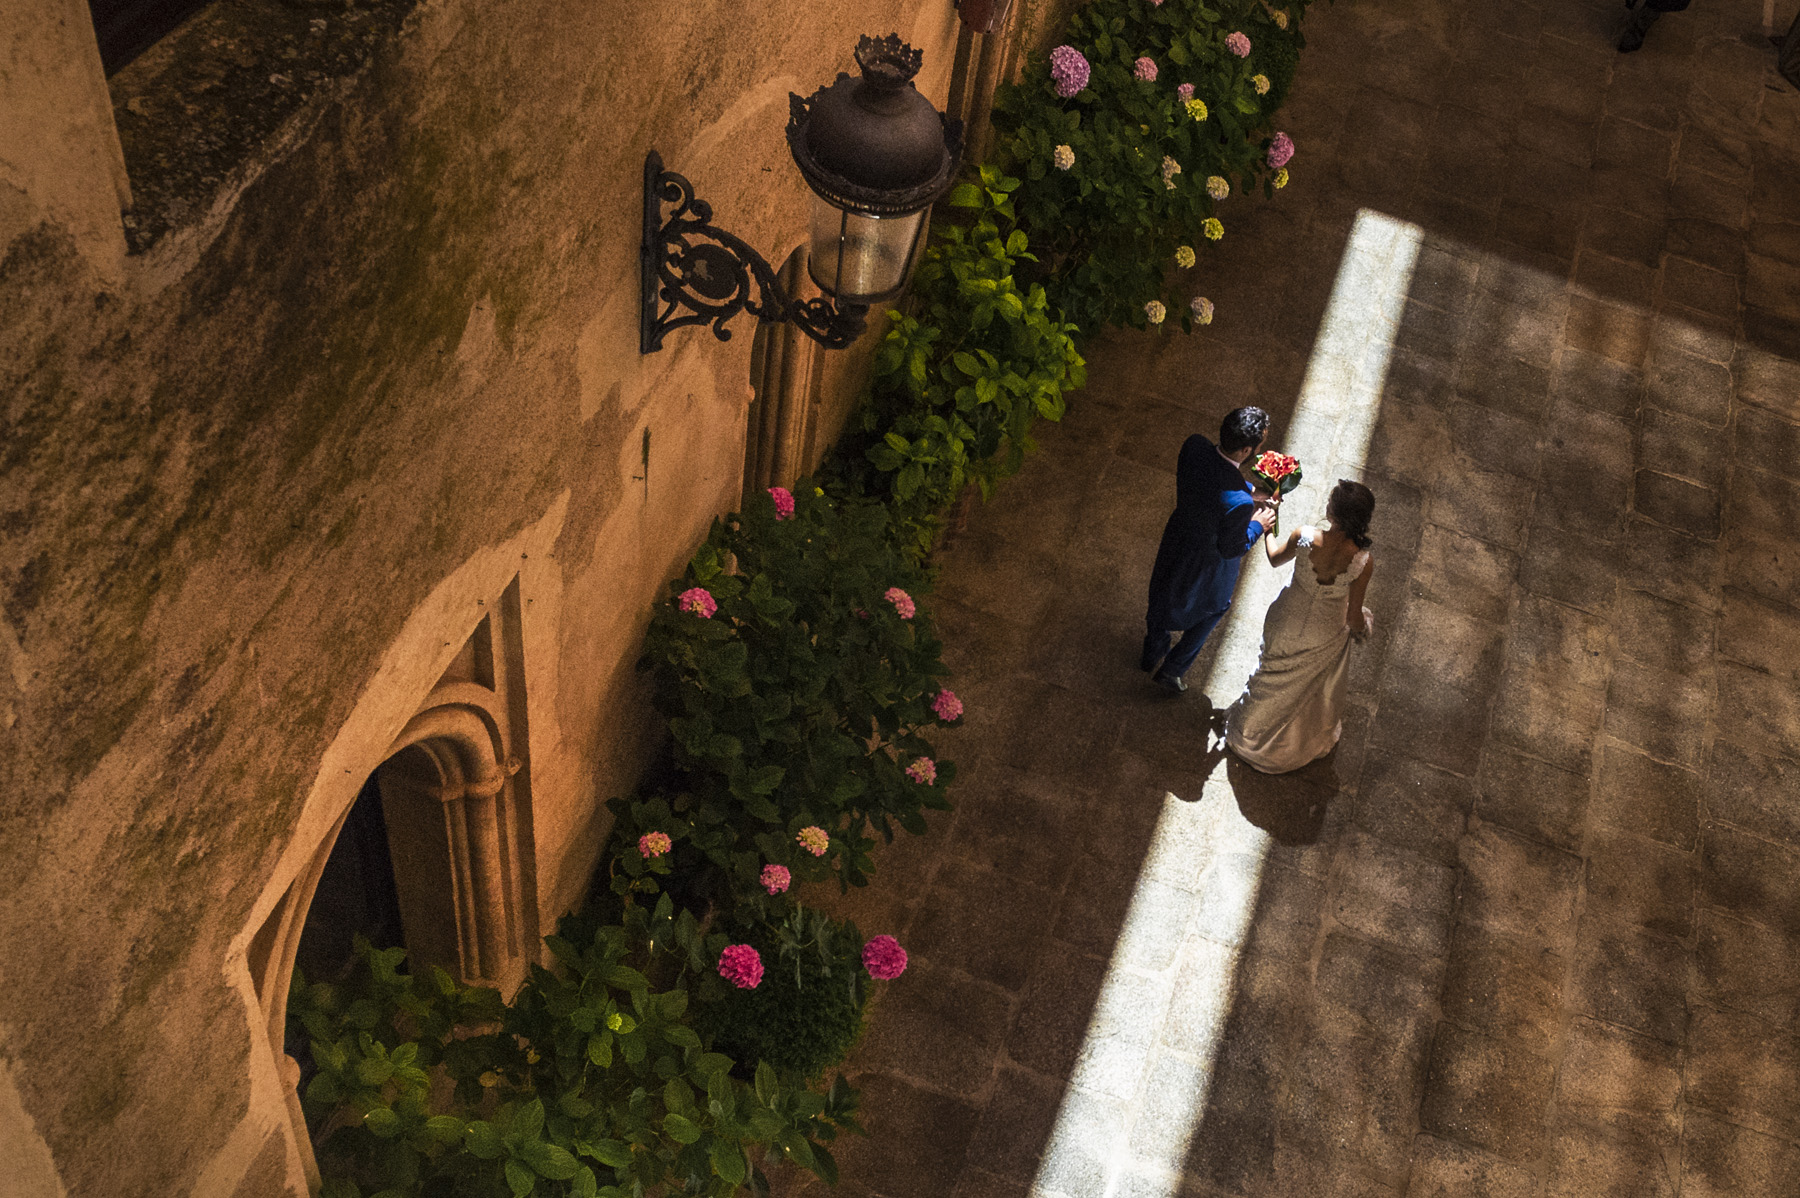 Fotografo de bodas profesional en Marbella